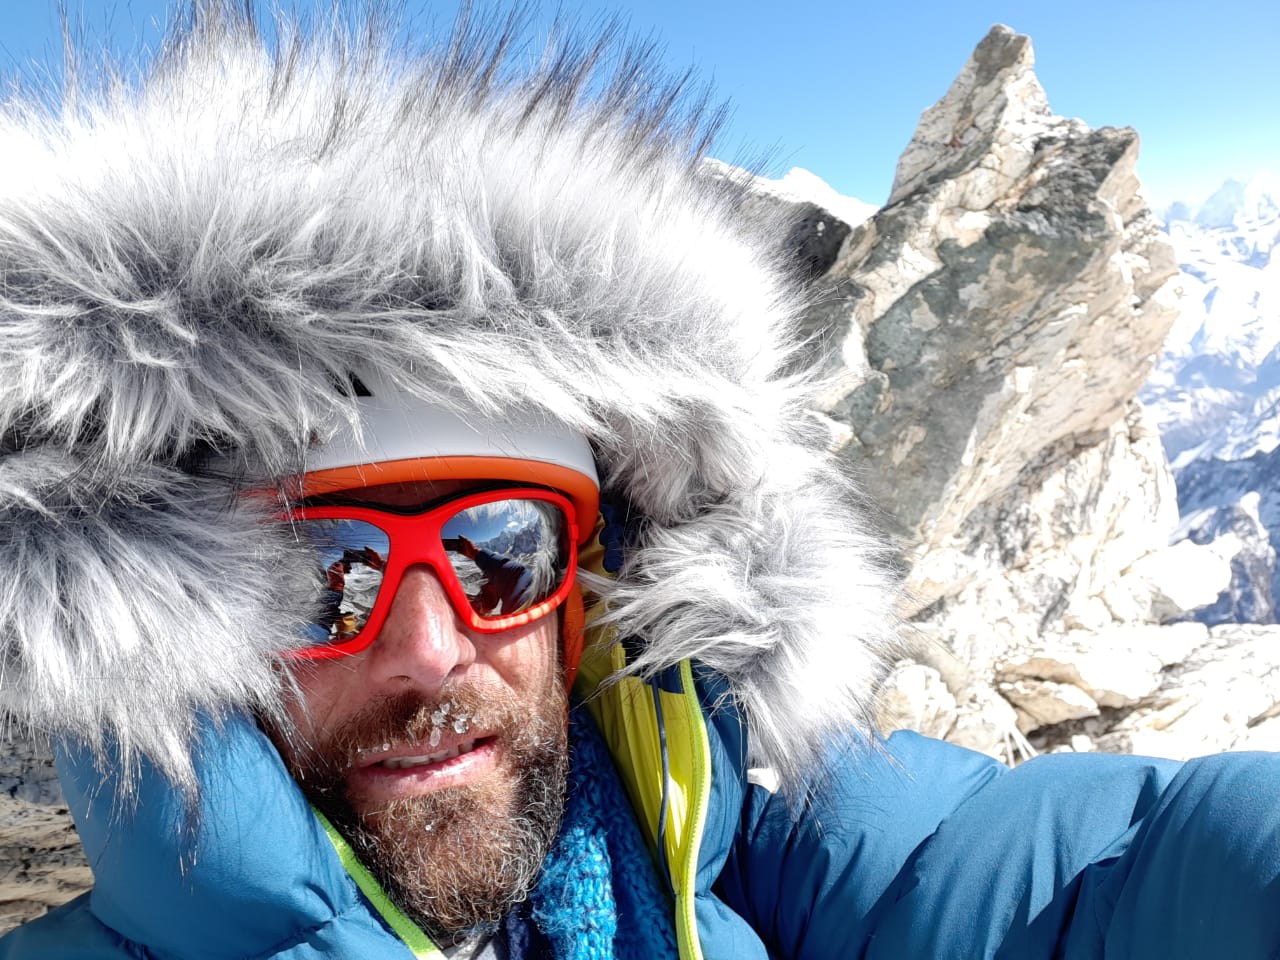 Alex Txikon en el Ama Dablam invernal